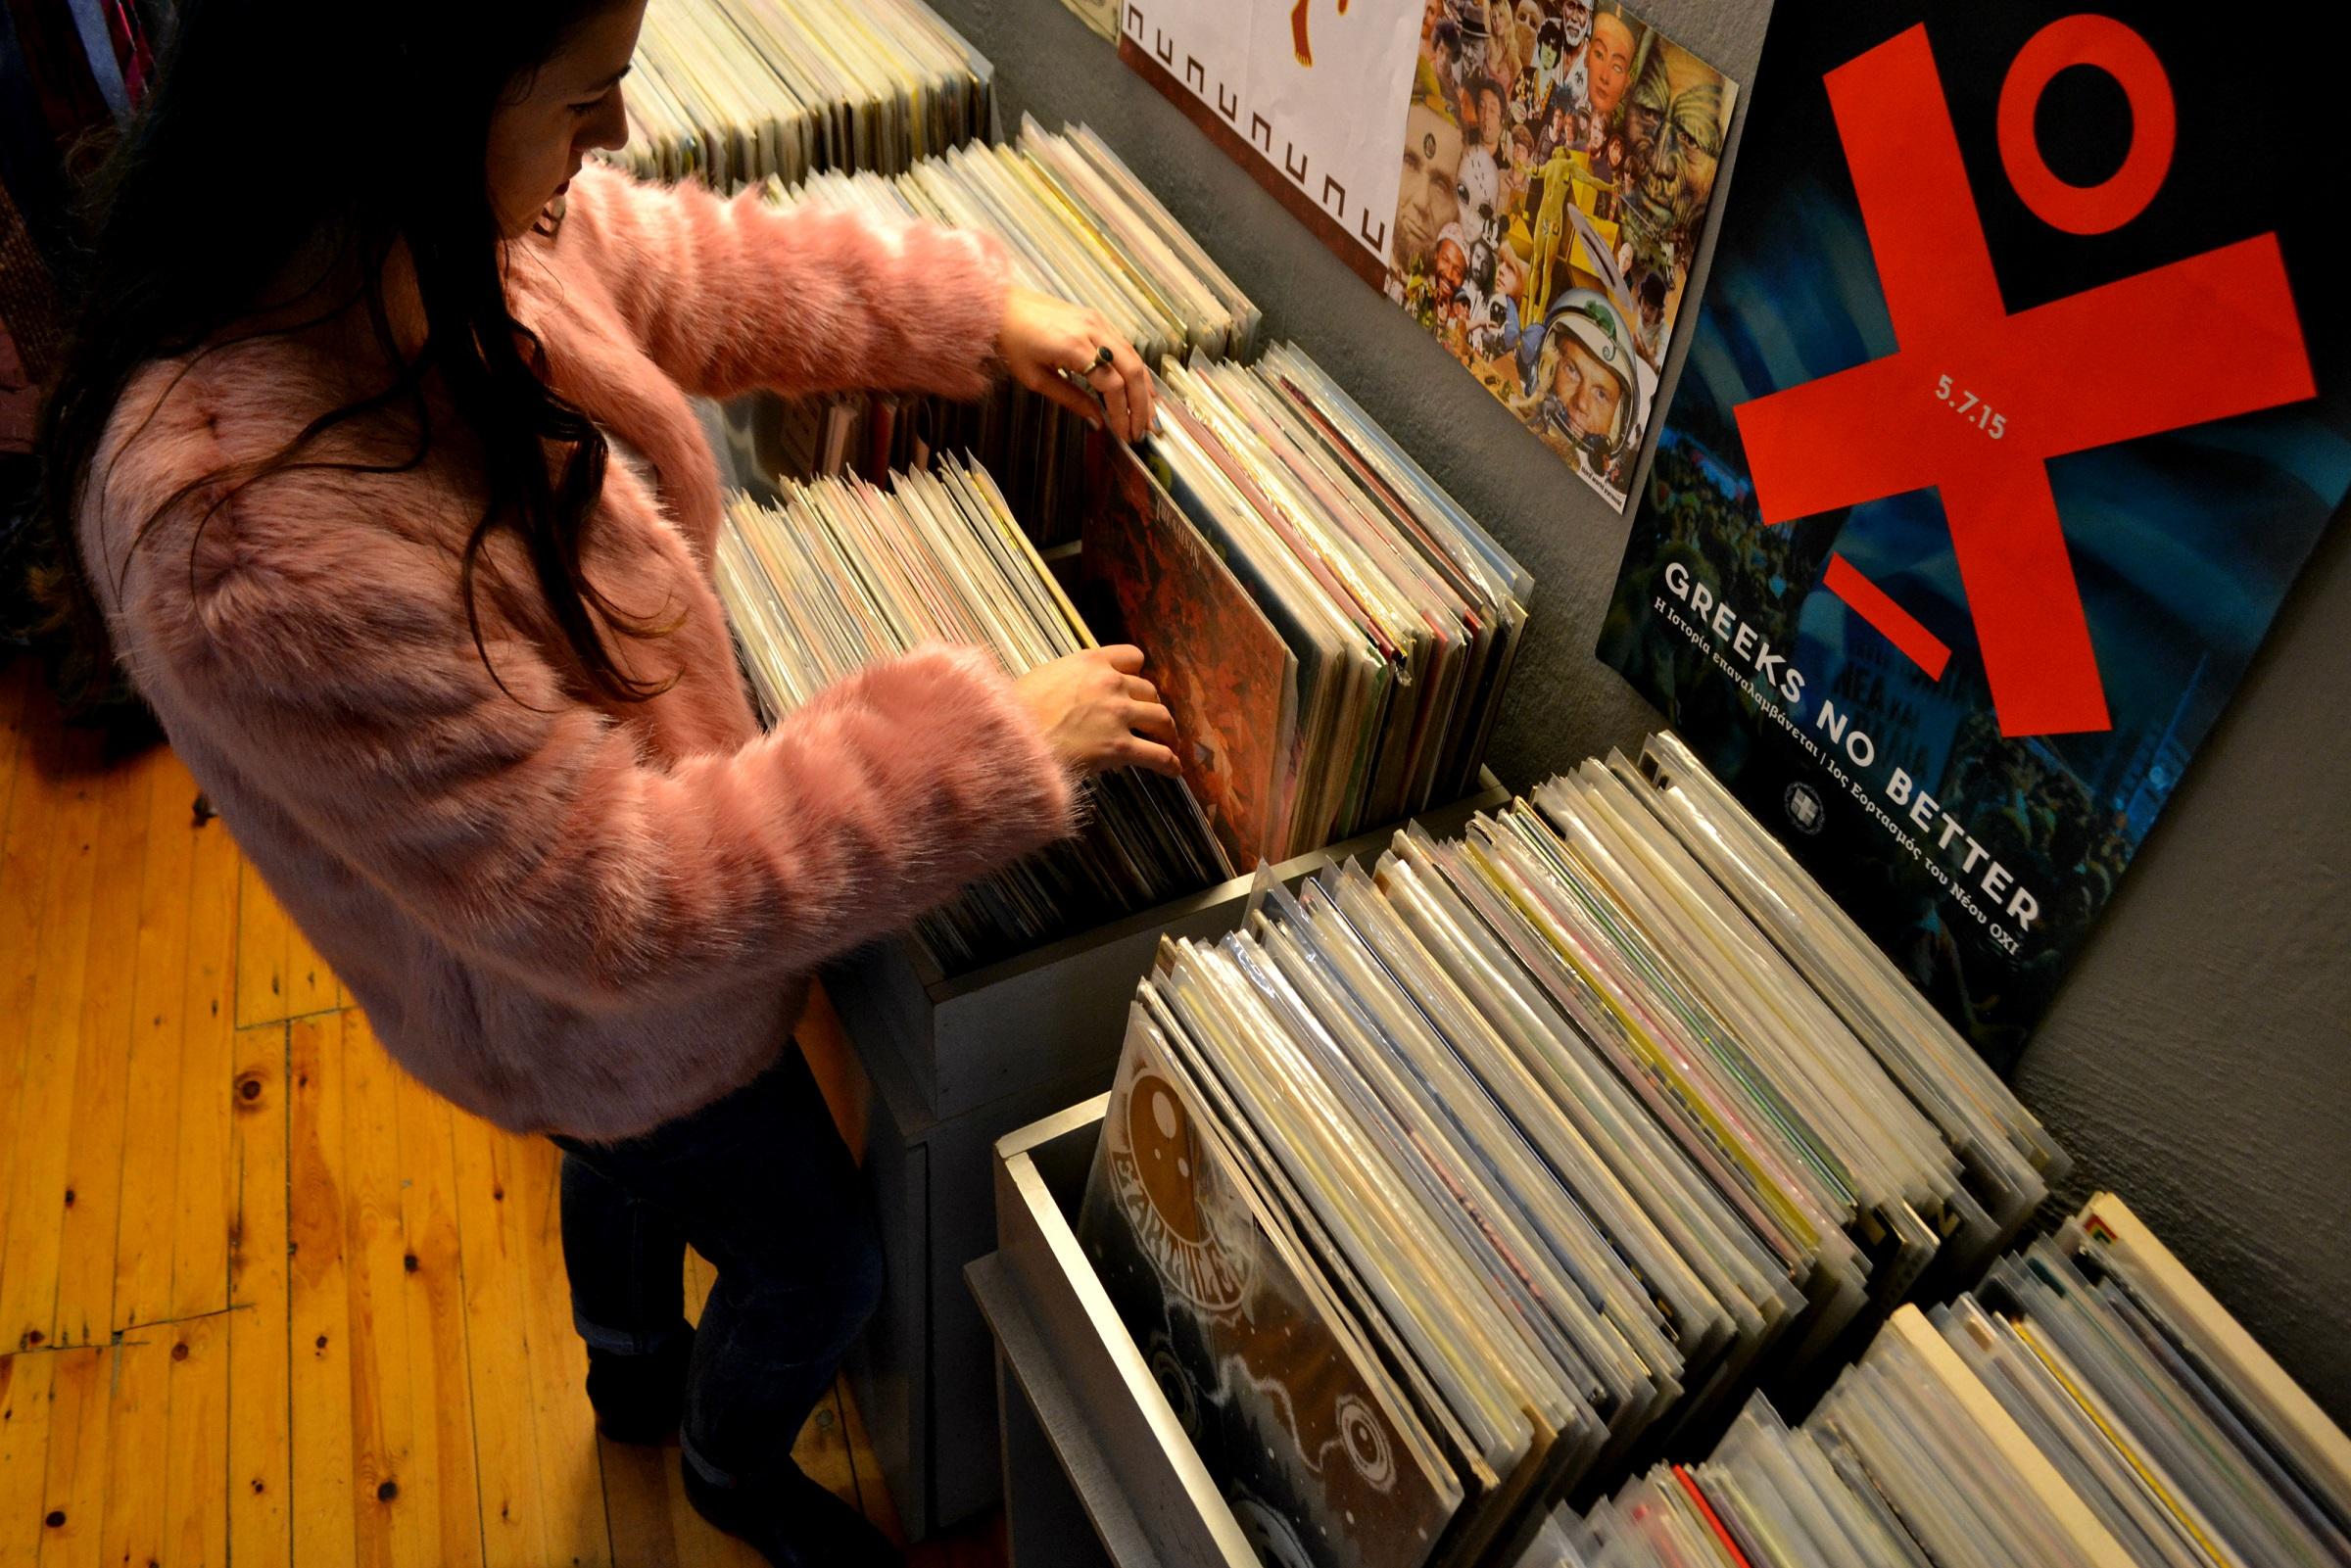 0a8a705fbe58 Και επειδή όλοι εδώ είμαστε λίγο vinyl junkies, έχε υπόψη ότι στο Handover  τα ρούχα συνυπάρχουν με τους δίσκους και η συλλογή των εκατοντάδων βινυλίων  ...